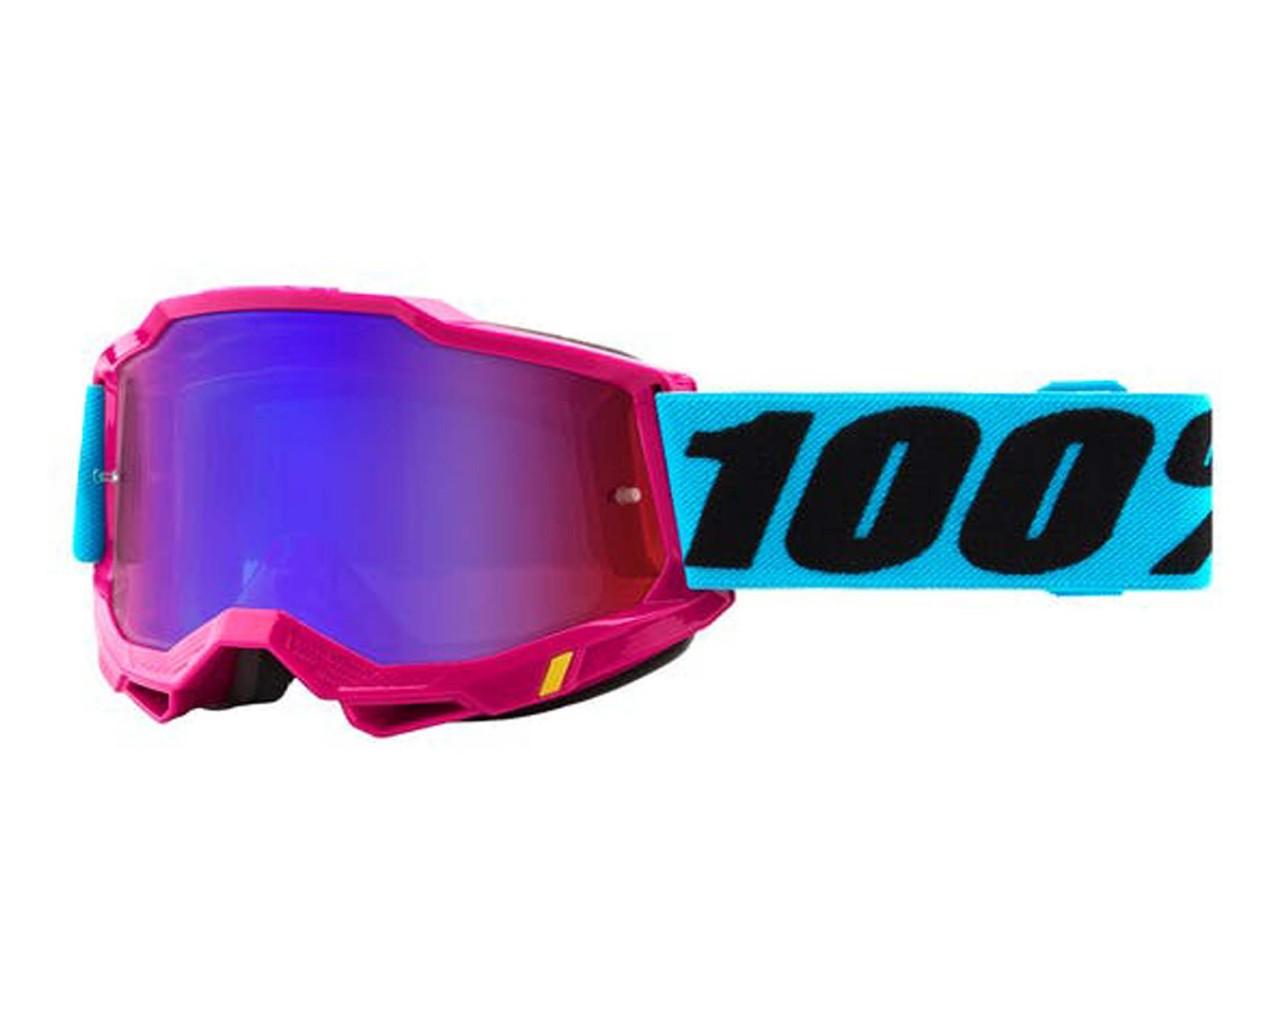 100% Accuri Generation 2 goggle - anti fog mirror lens | Lefleur